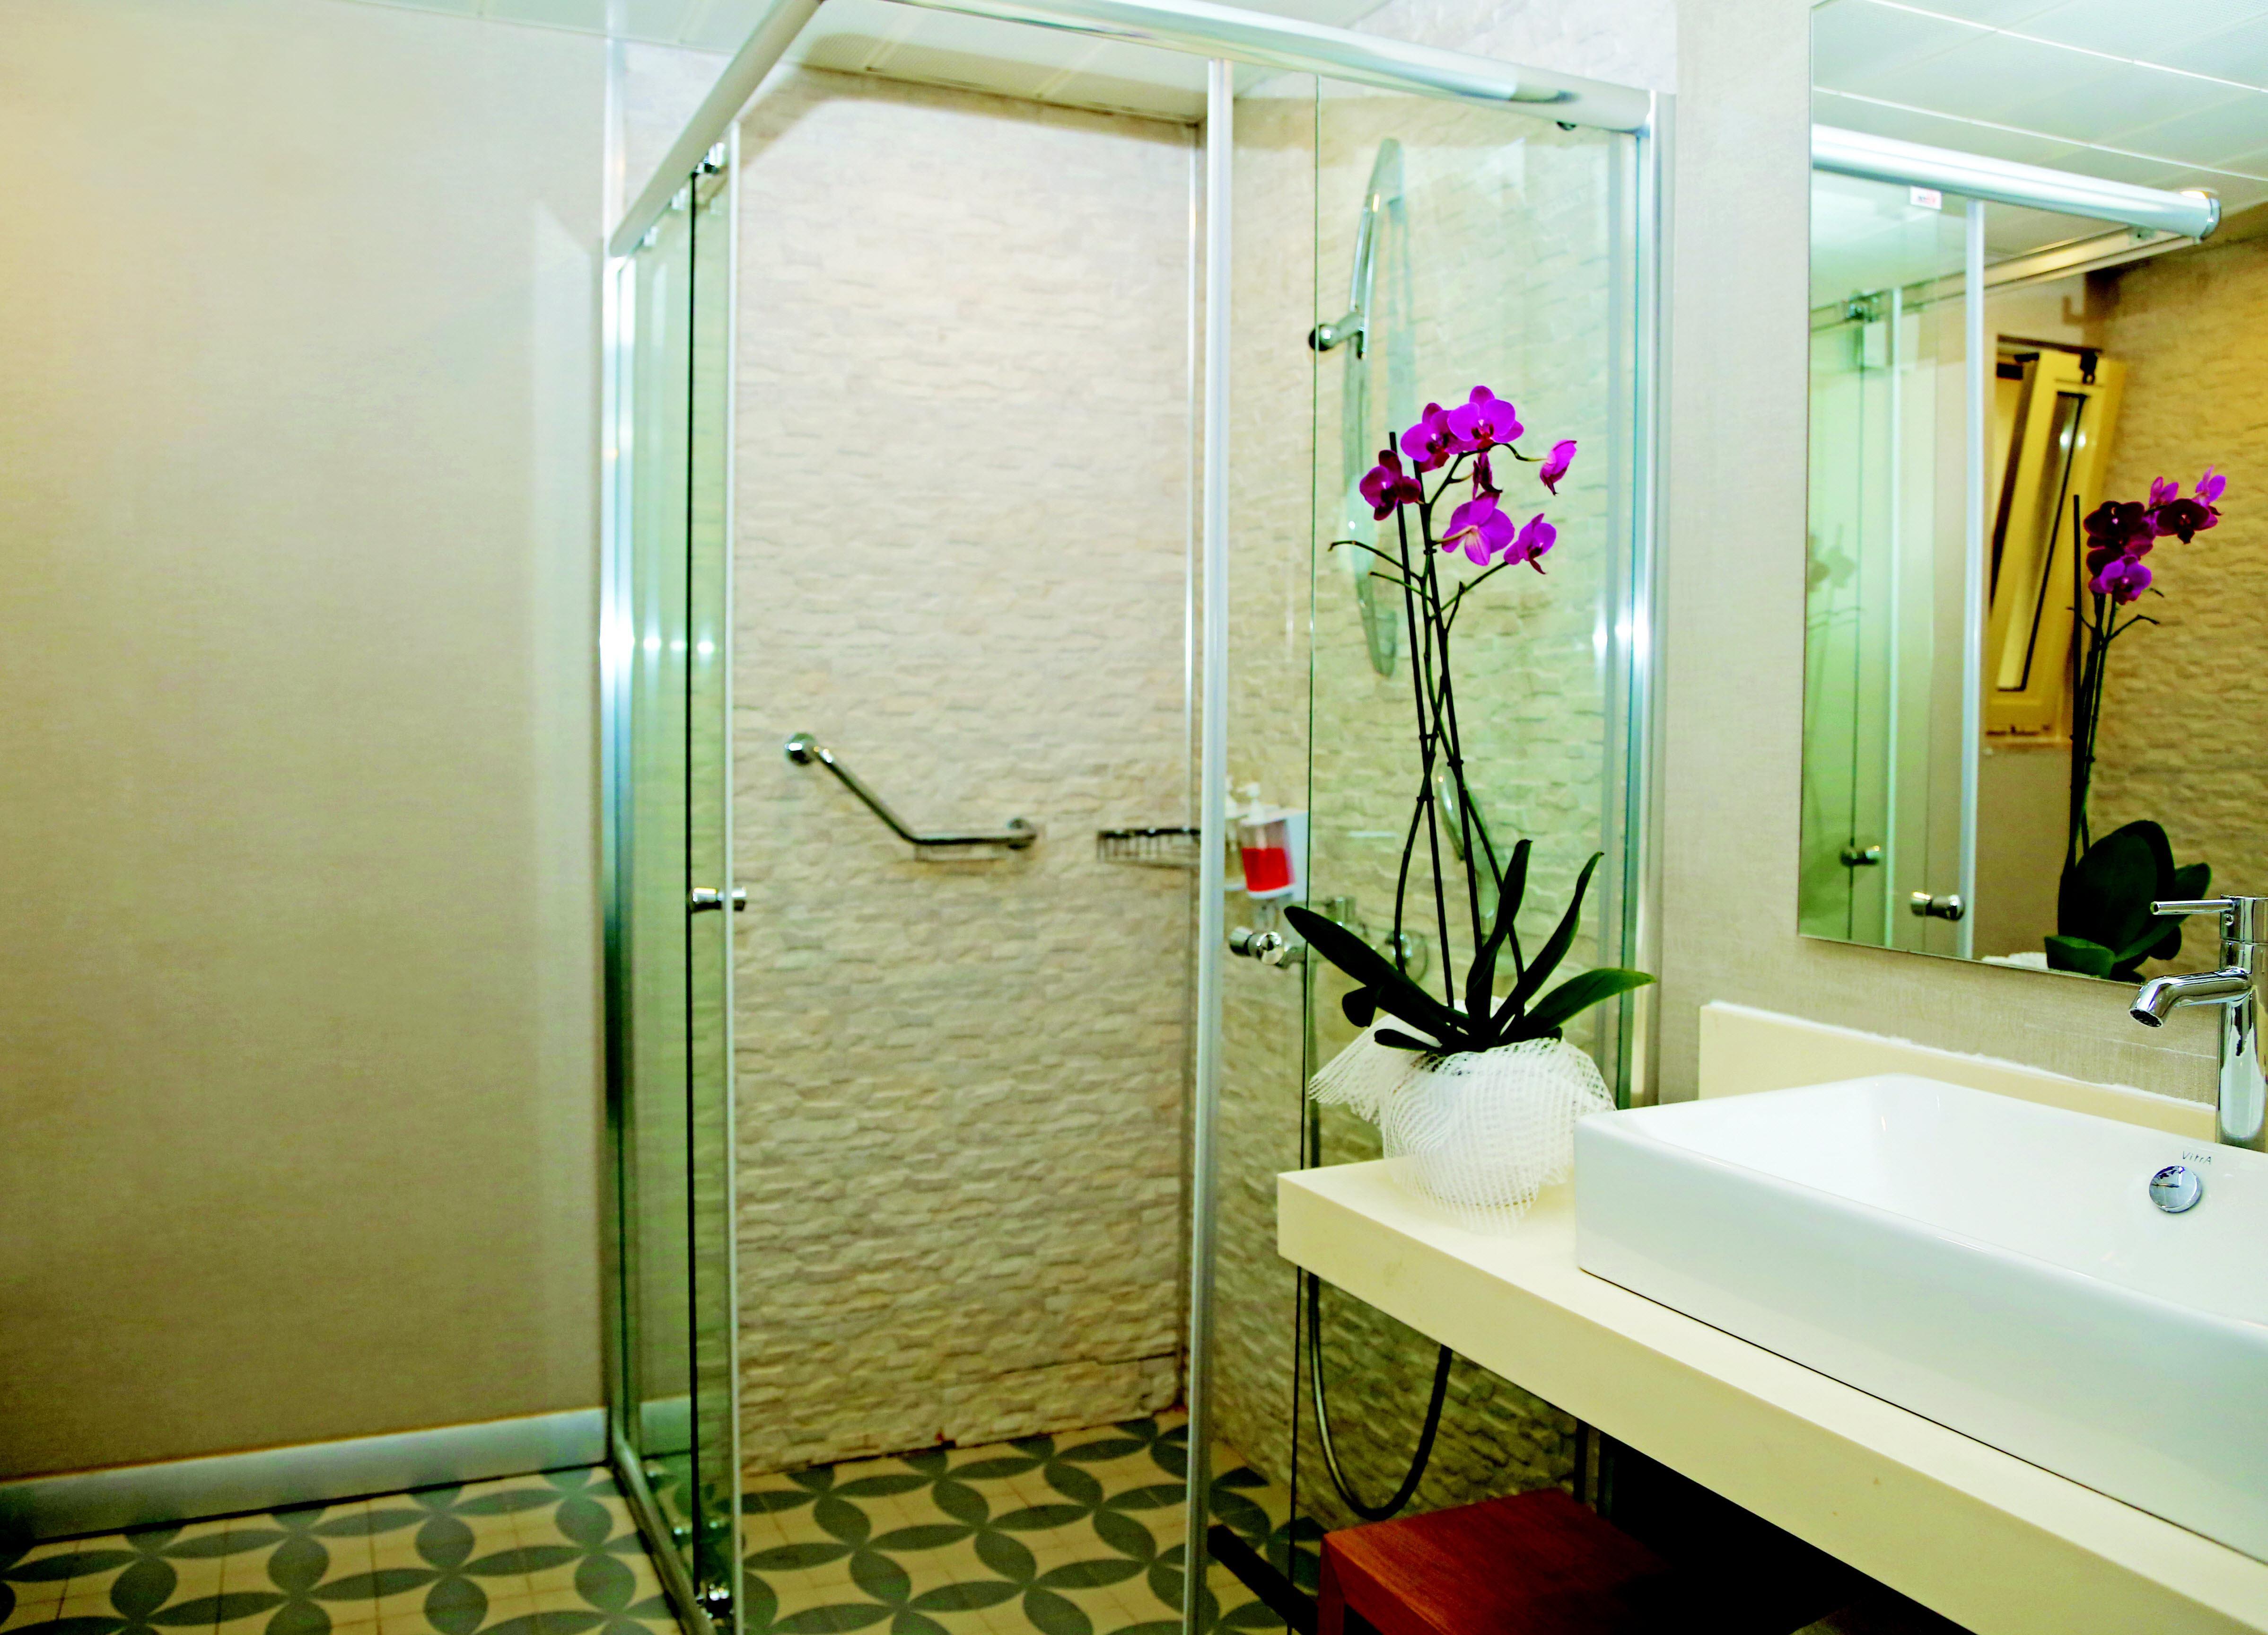 http://www.orextravel.sk/OREX/hotelphotos/ulusoy-kemer-holiday-club-area-0034.jpg